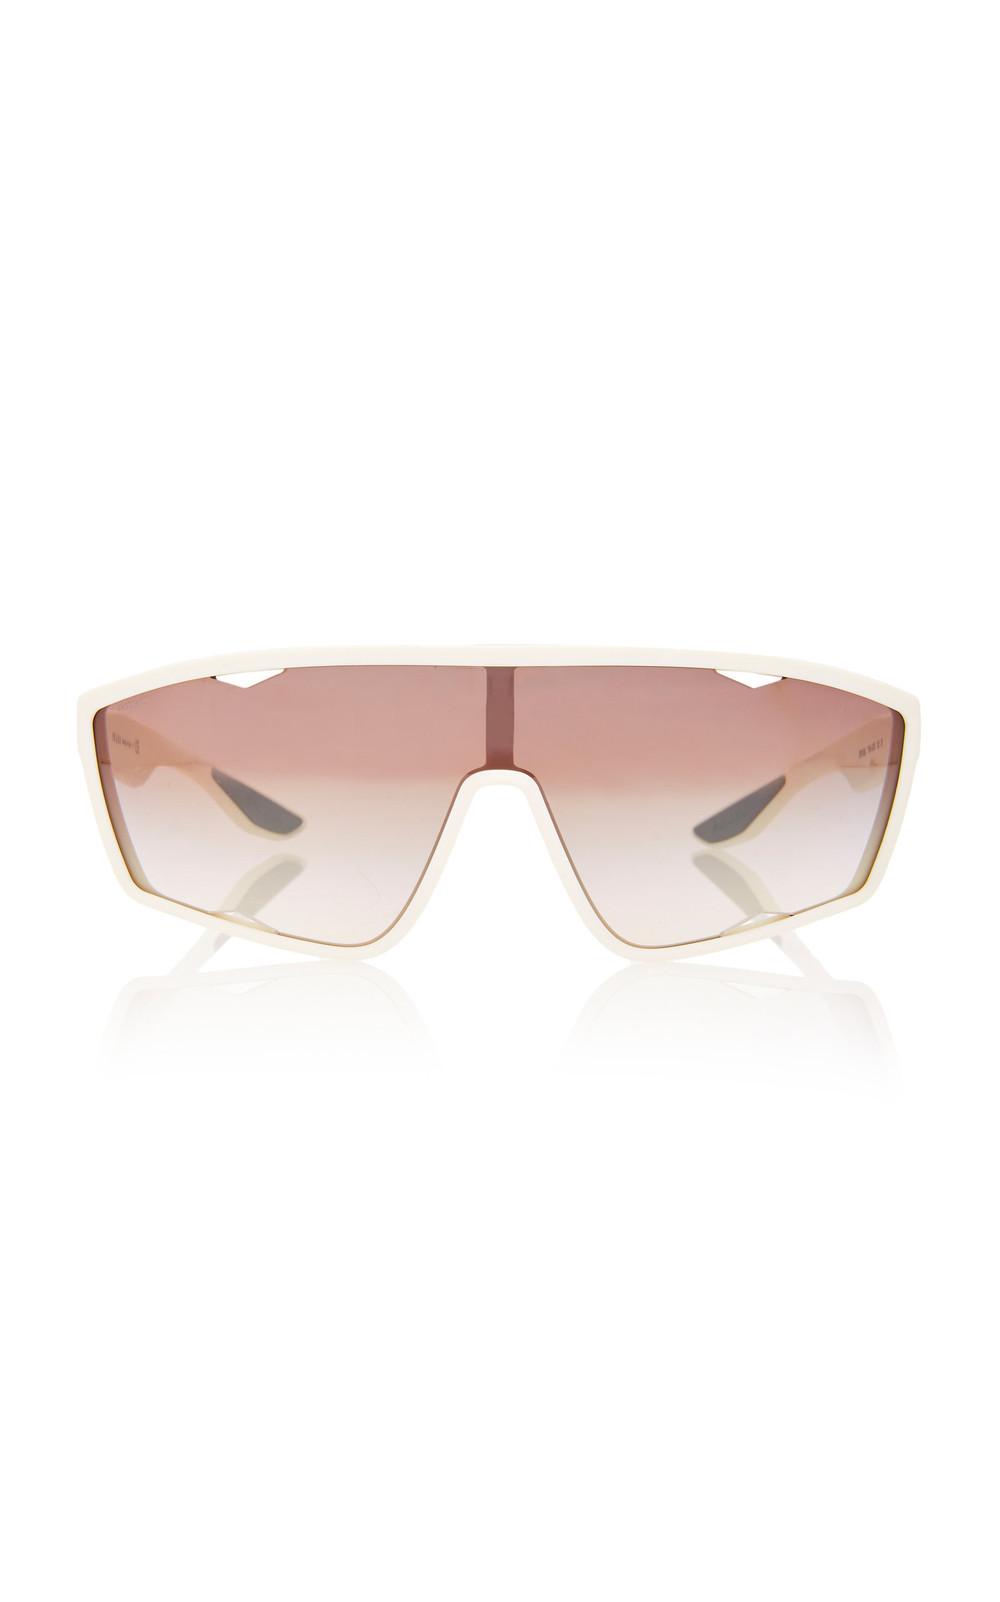 Prada Linea Rossa Square-Frame Acetate Sunglasses in white